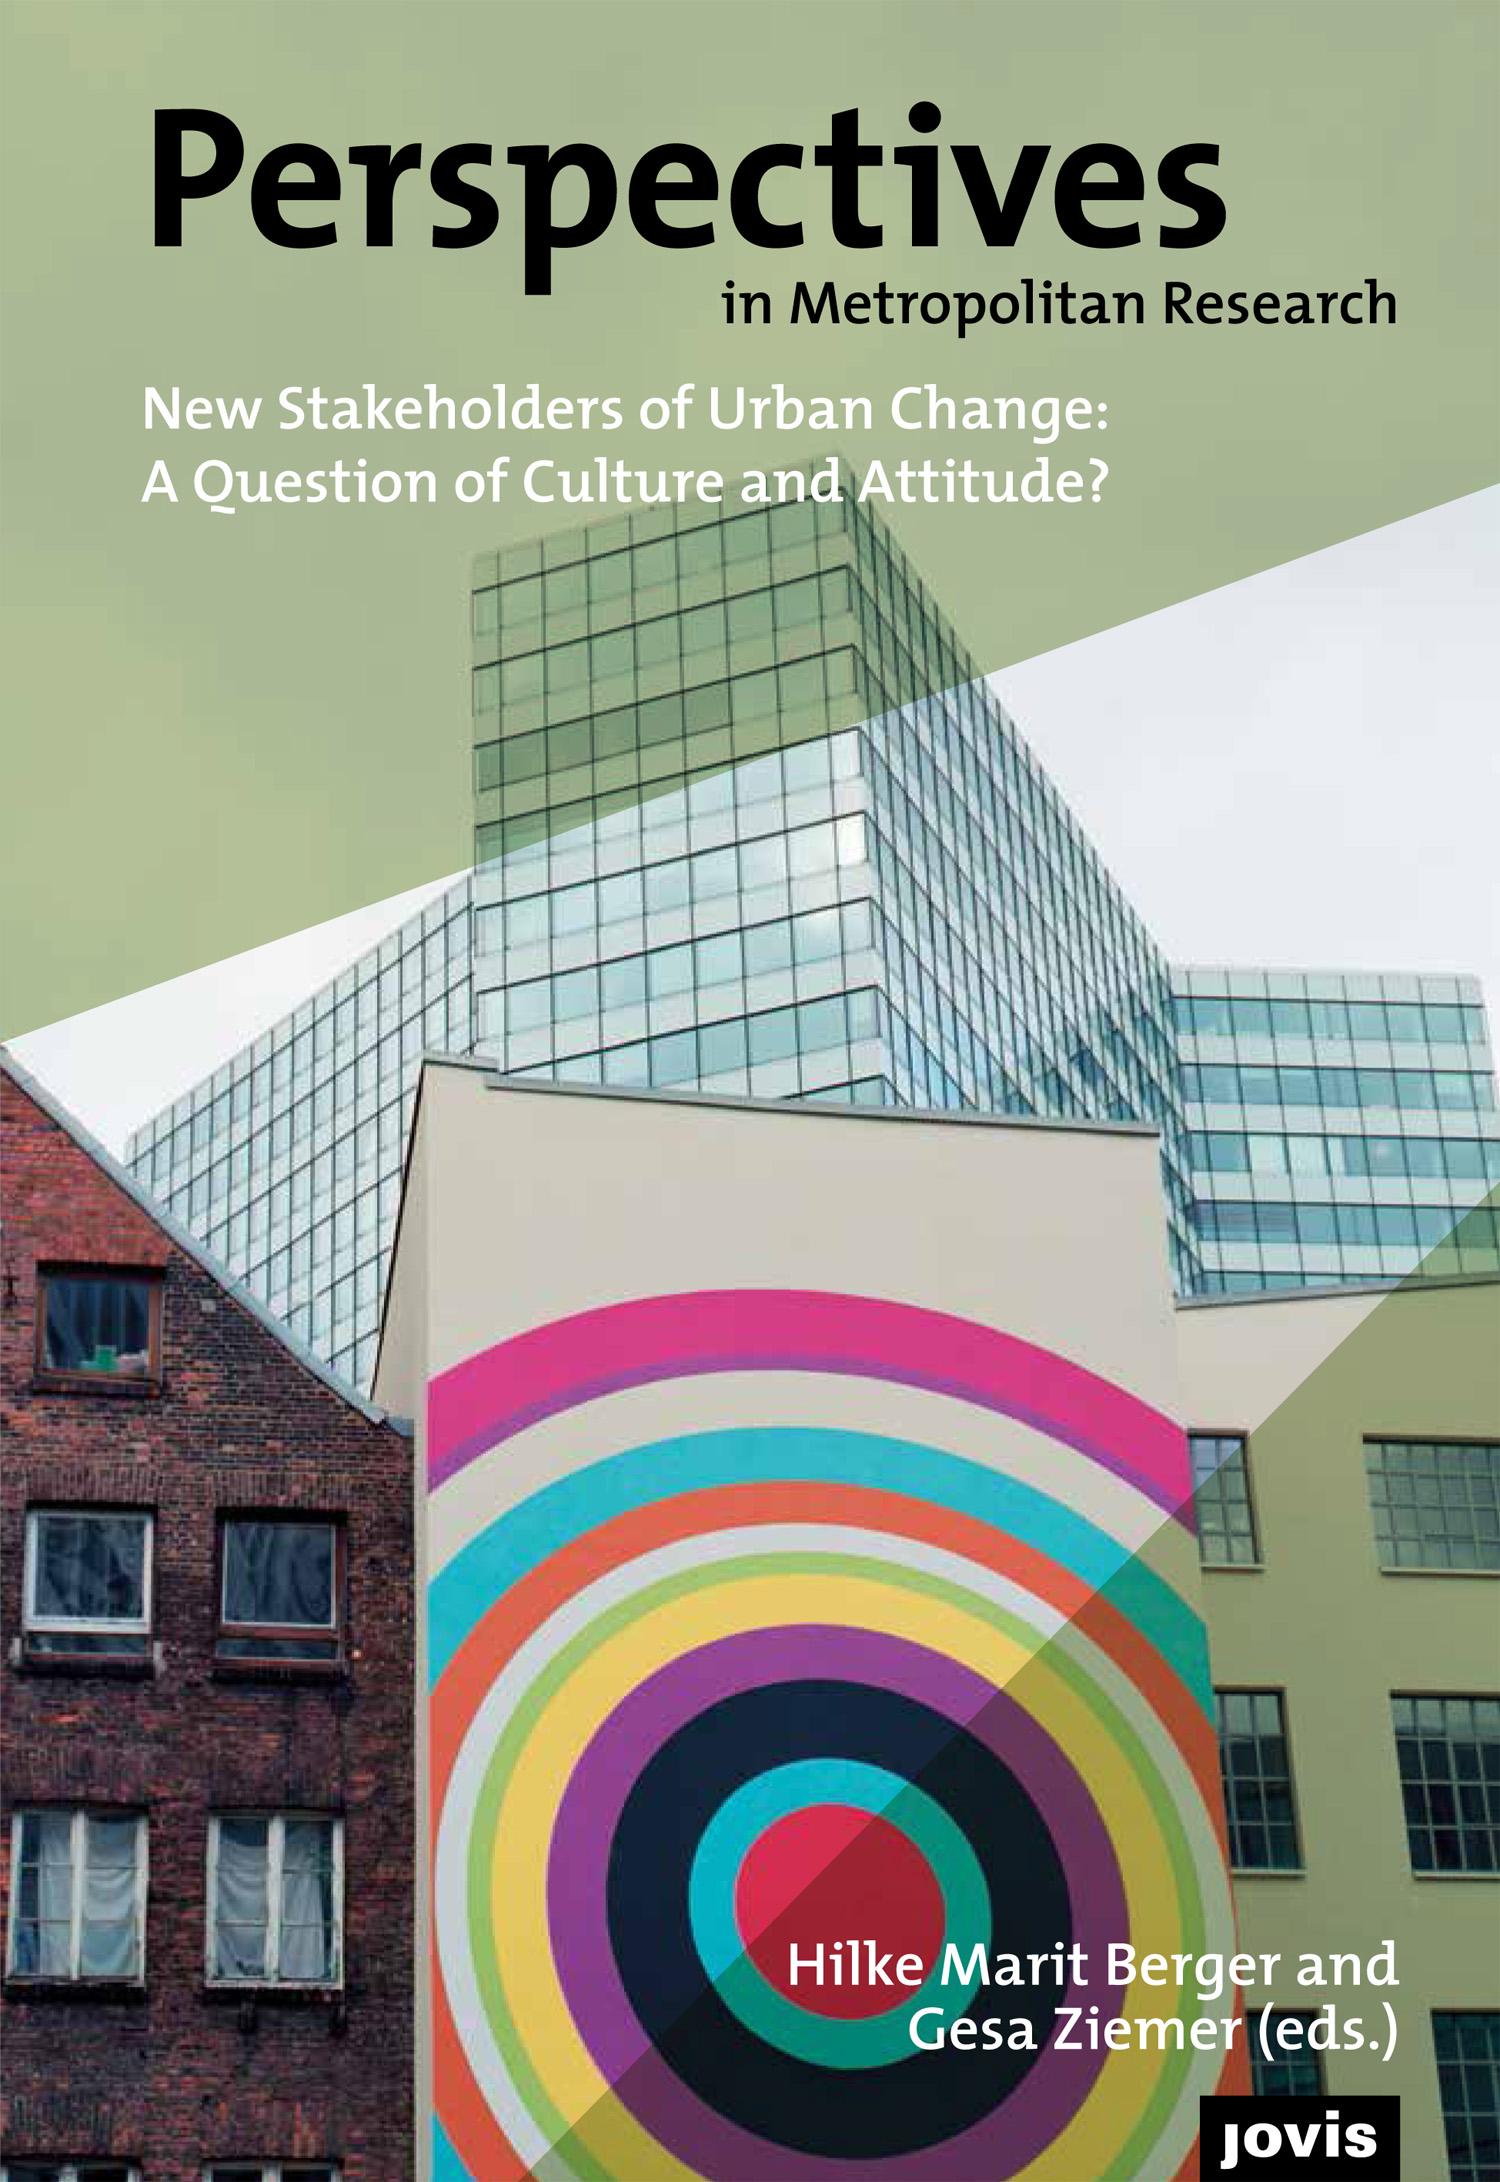 New Stakeholders of Urban Change, Jovis 2017